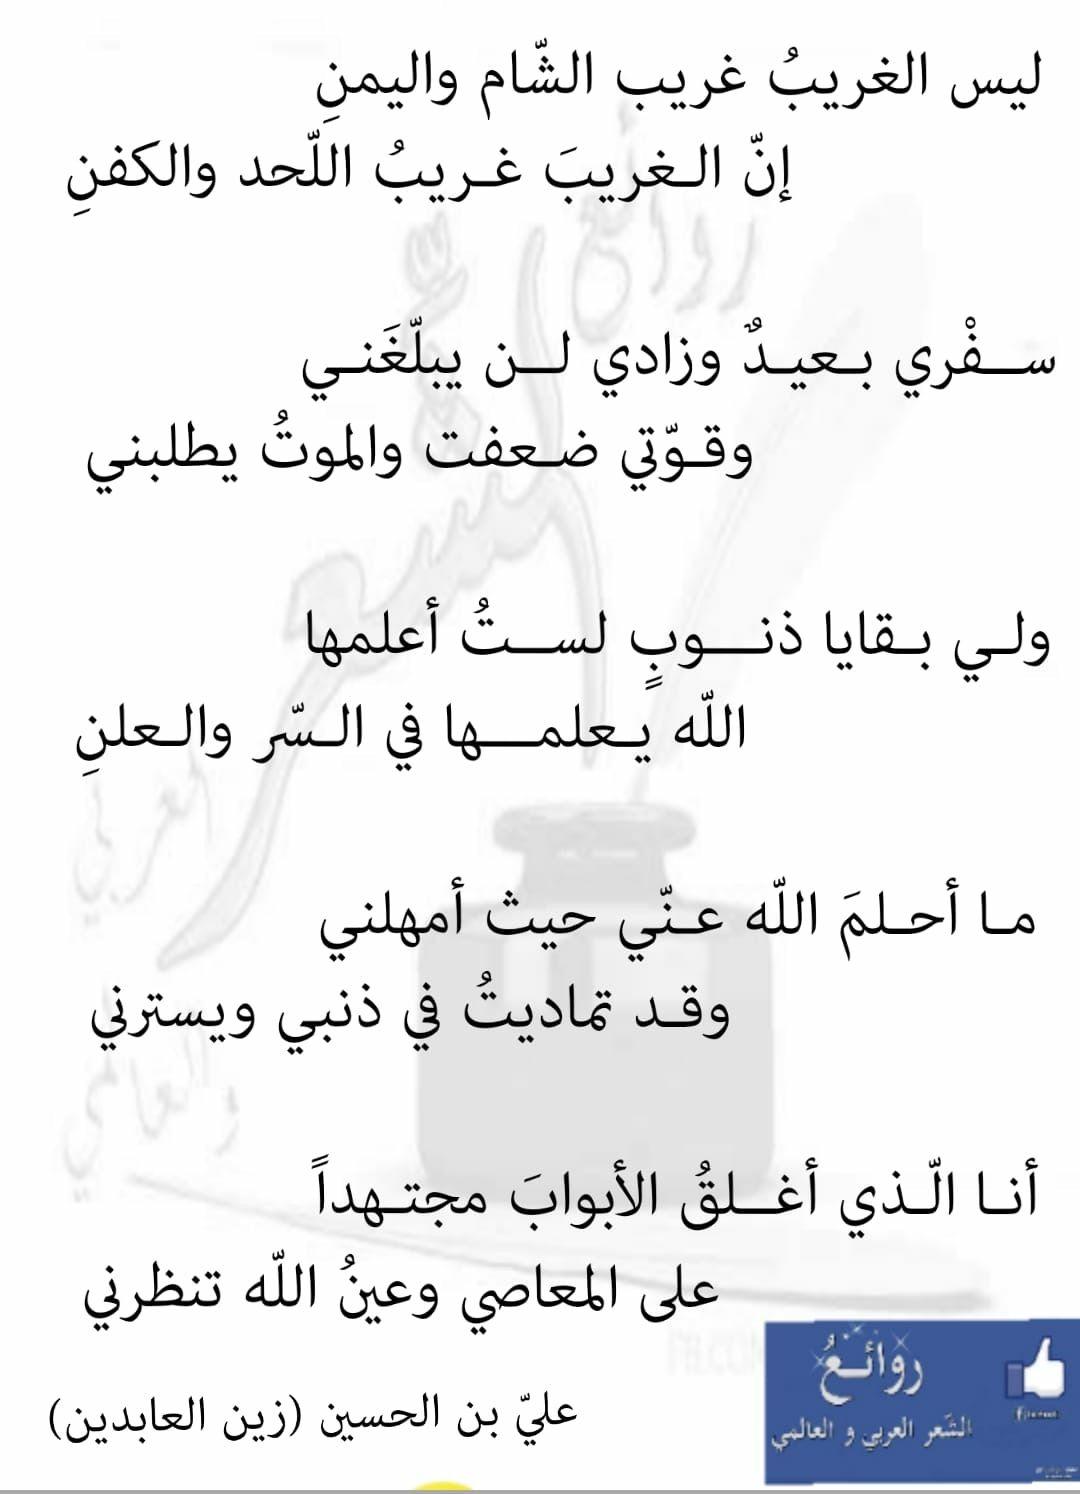 Pin By Zainab Hassan On Islam Math Math Equations Islam